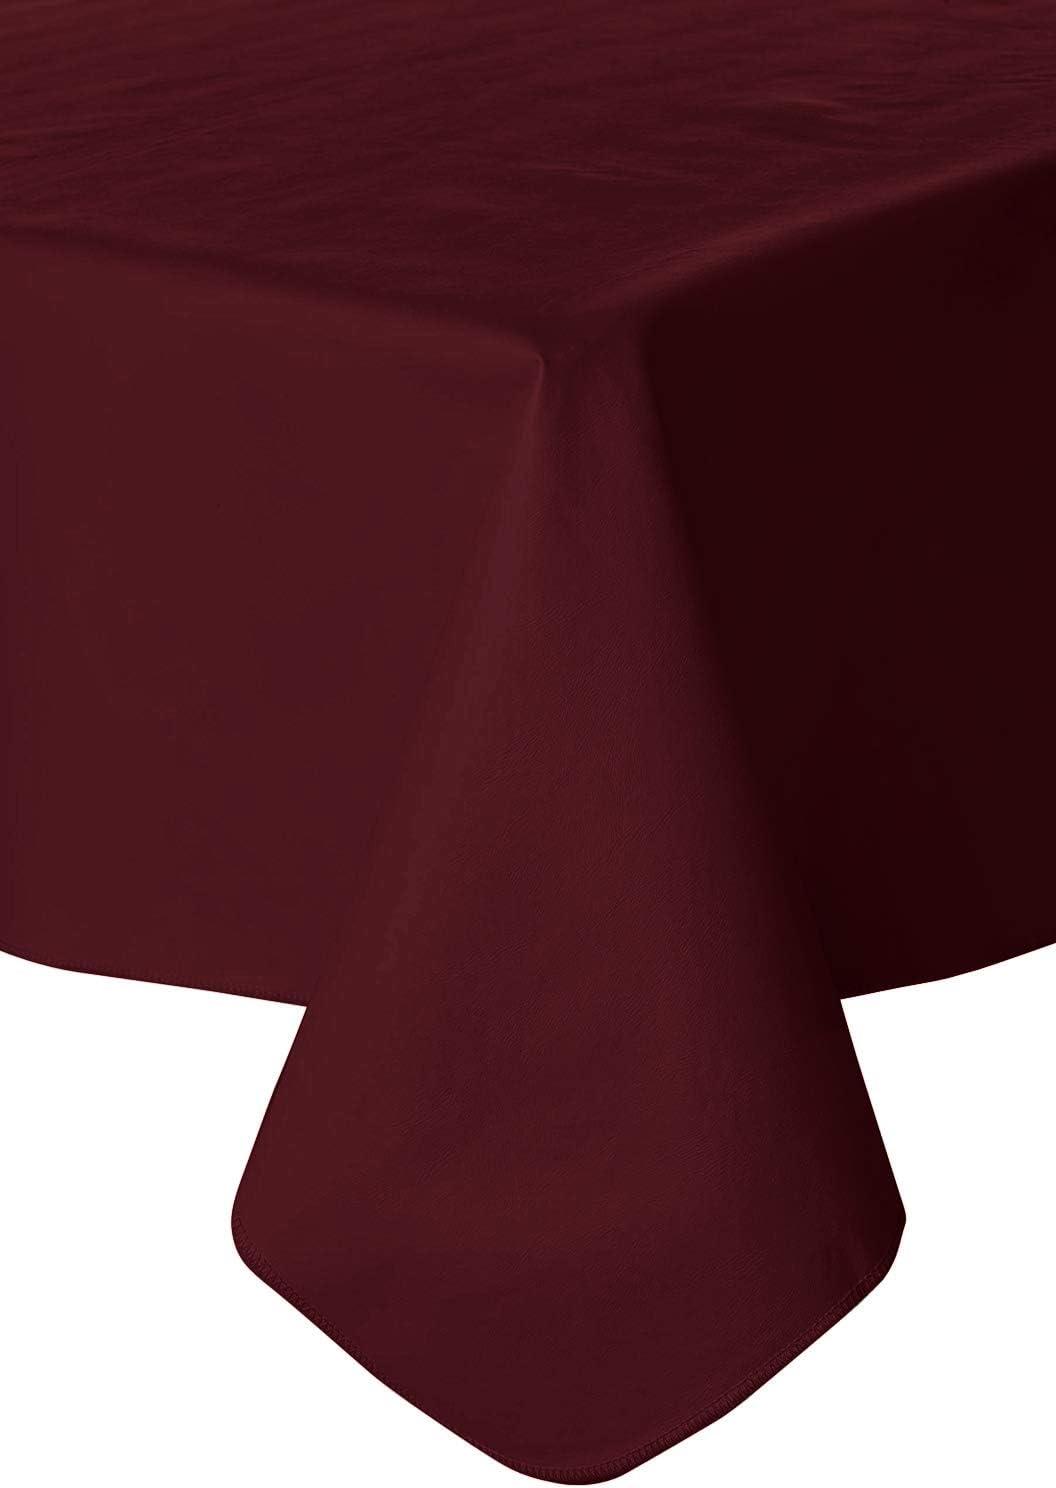 Galaxy Heavyweight Vinyl Tablecloth, 52X70 Oblong (Rectangle), Burgundy